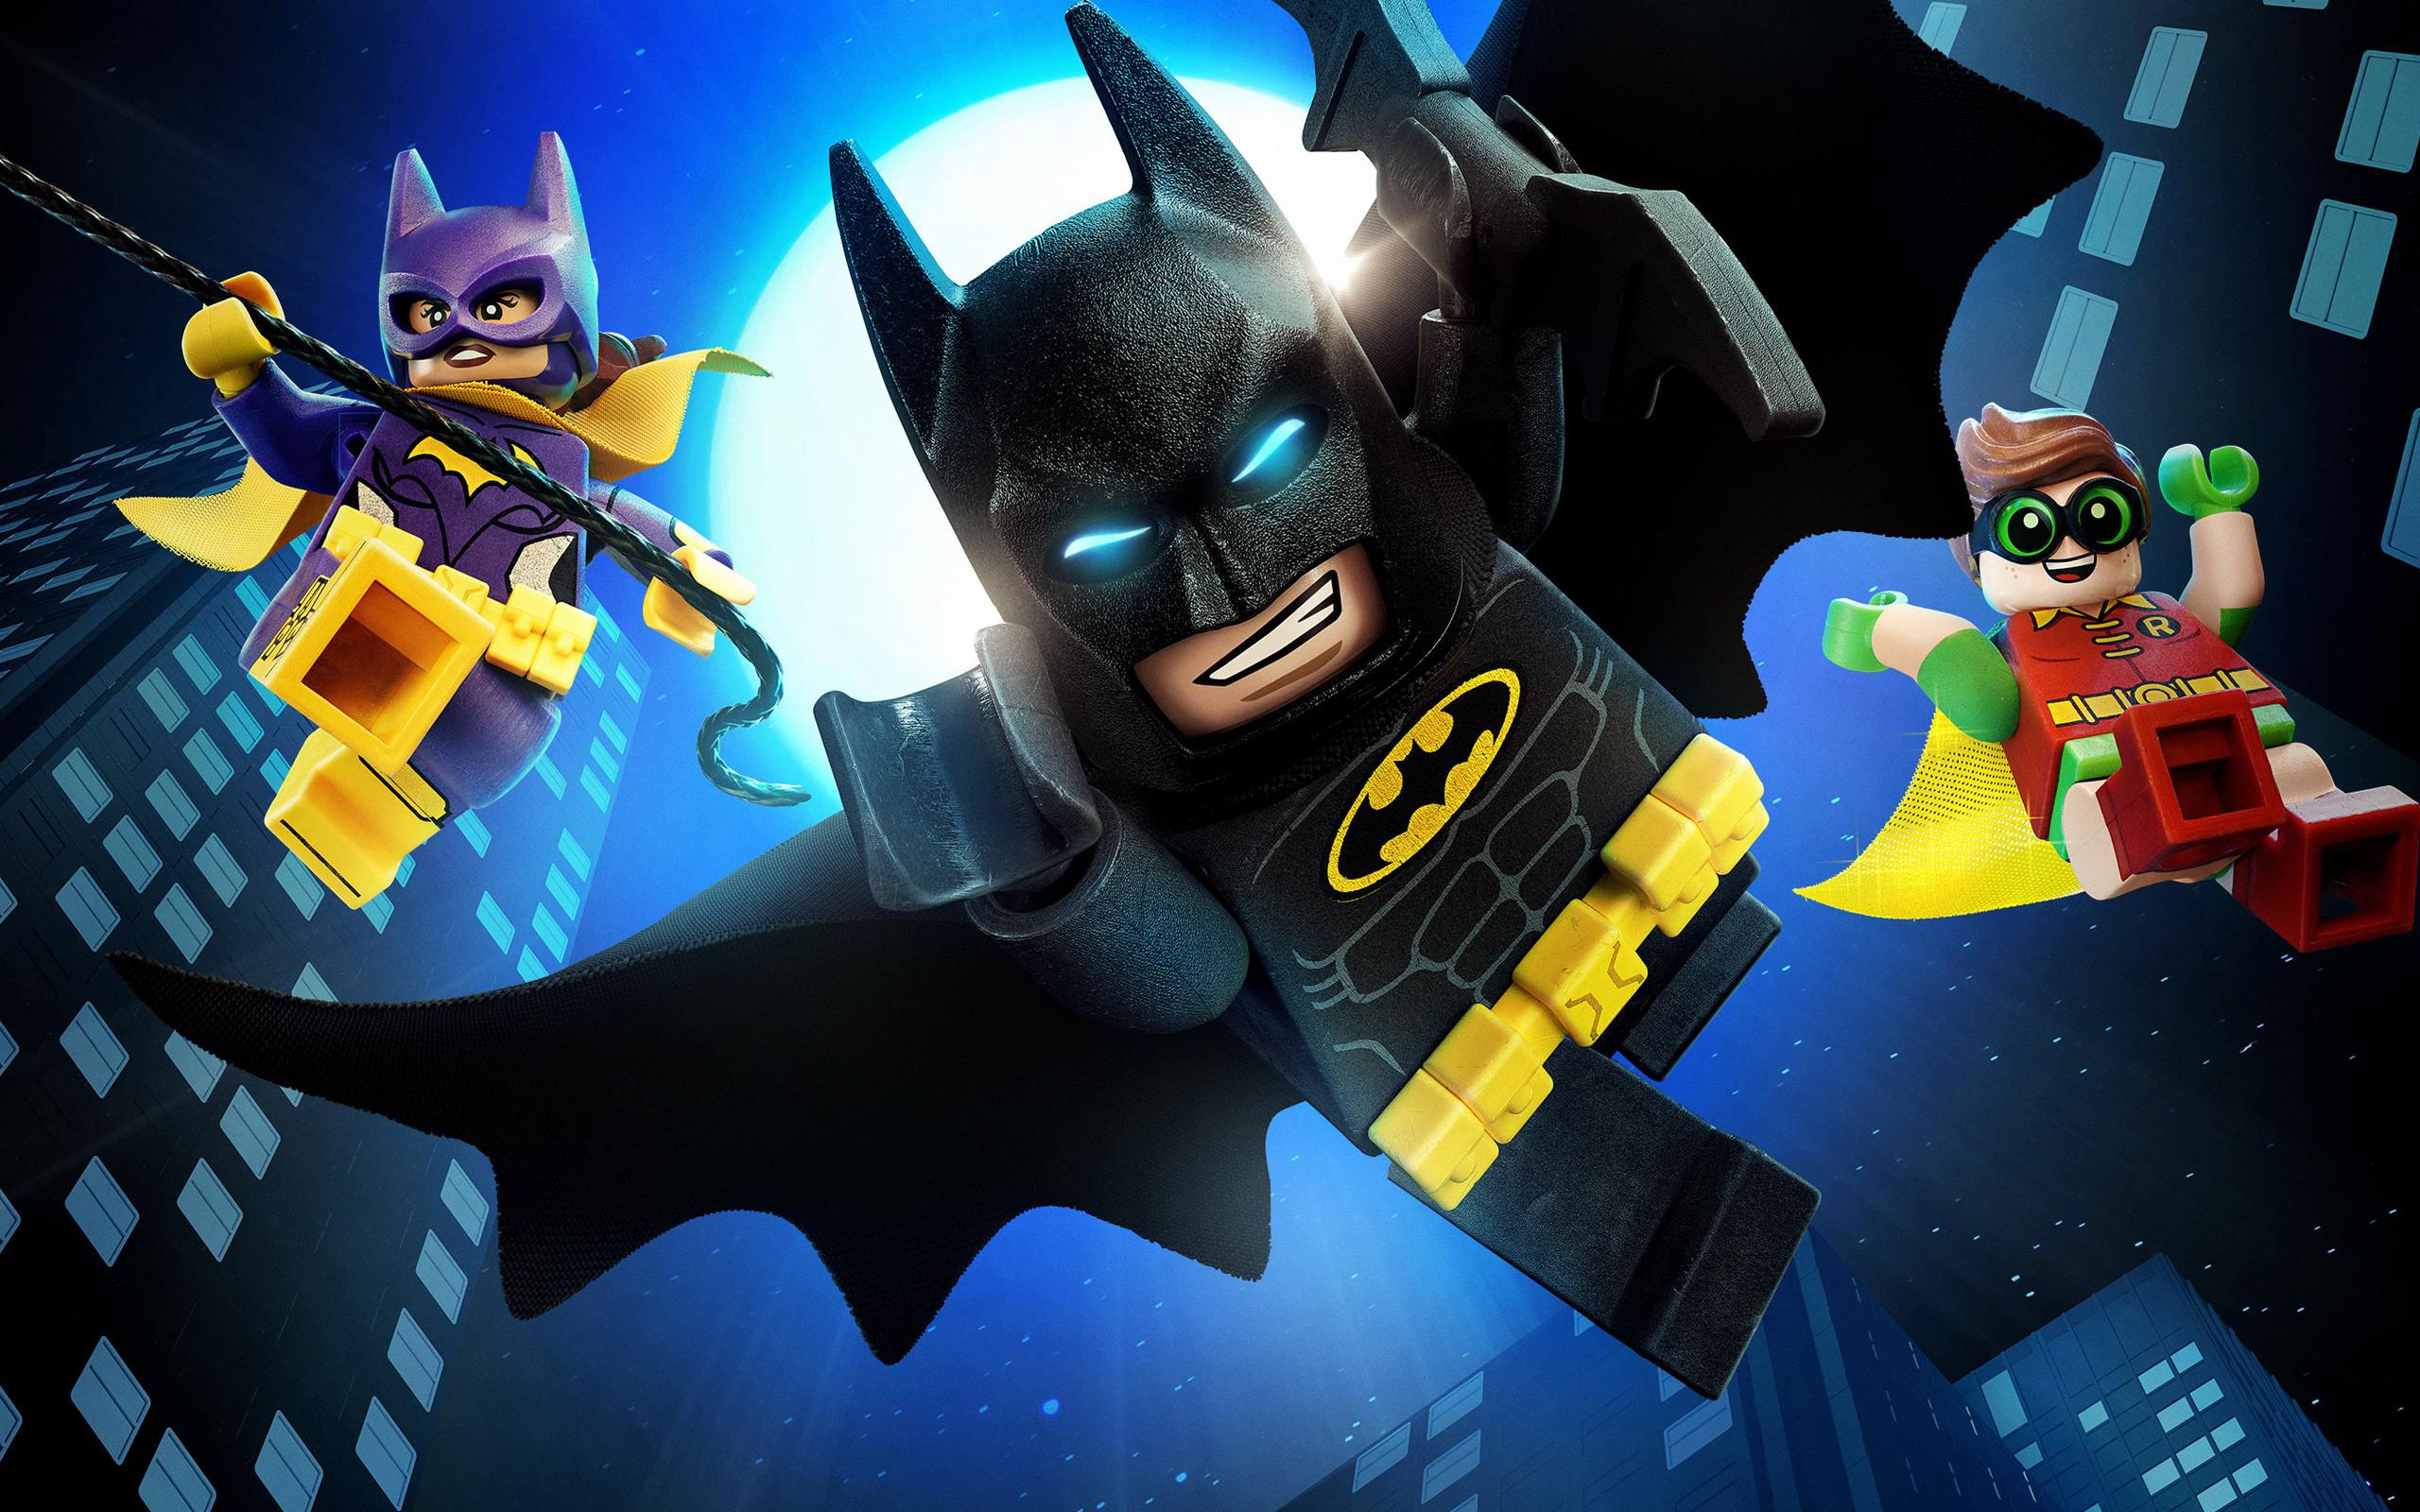 HD The LEGO Batman Movie wallpaper | The LEGO Batman Movie wallpapers hd |  Pinterest | Lego batman movie, Lego batman and Movie wallpapers